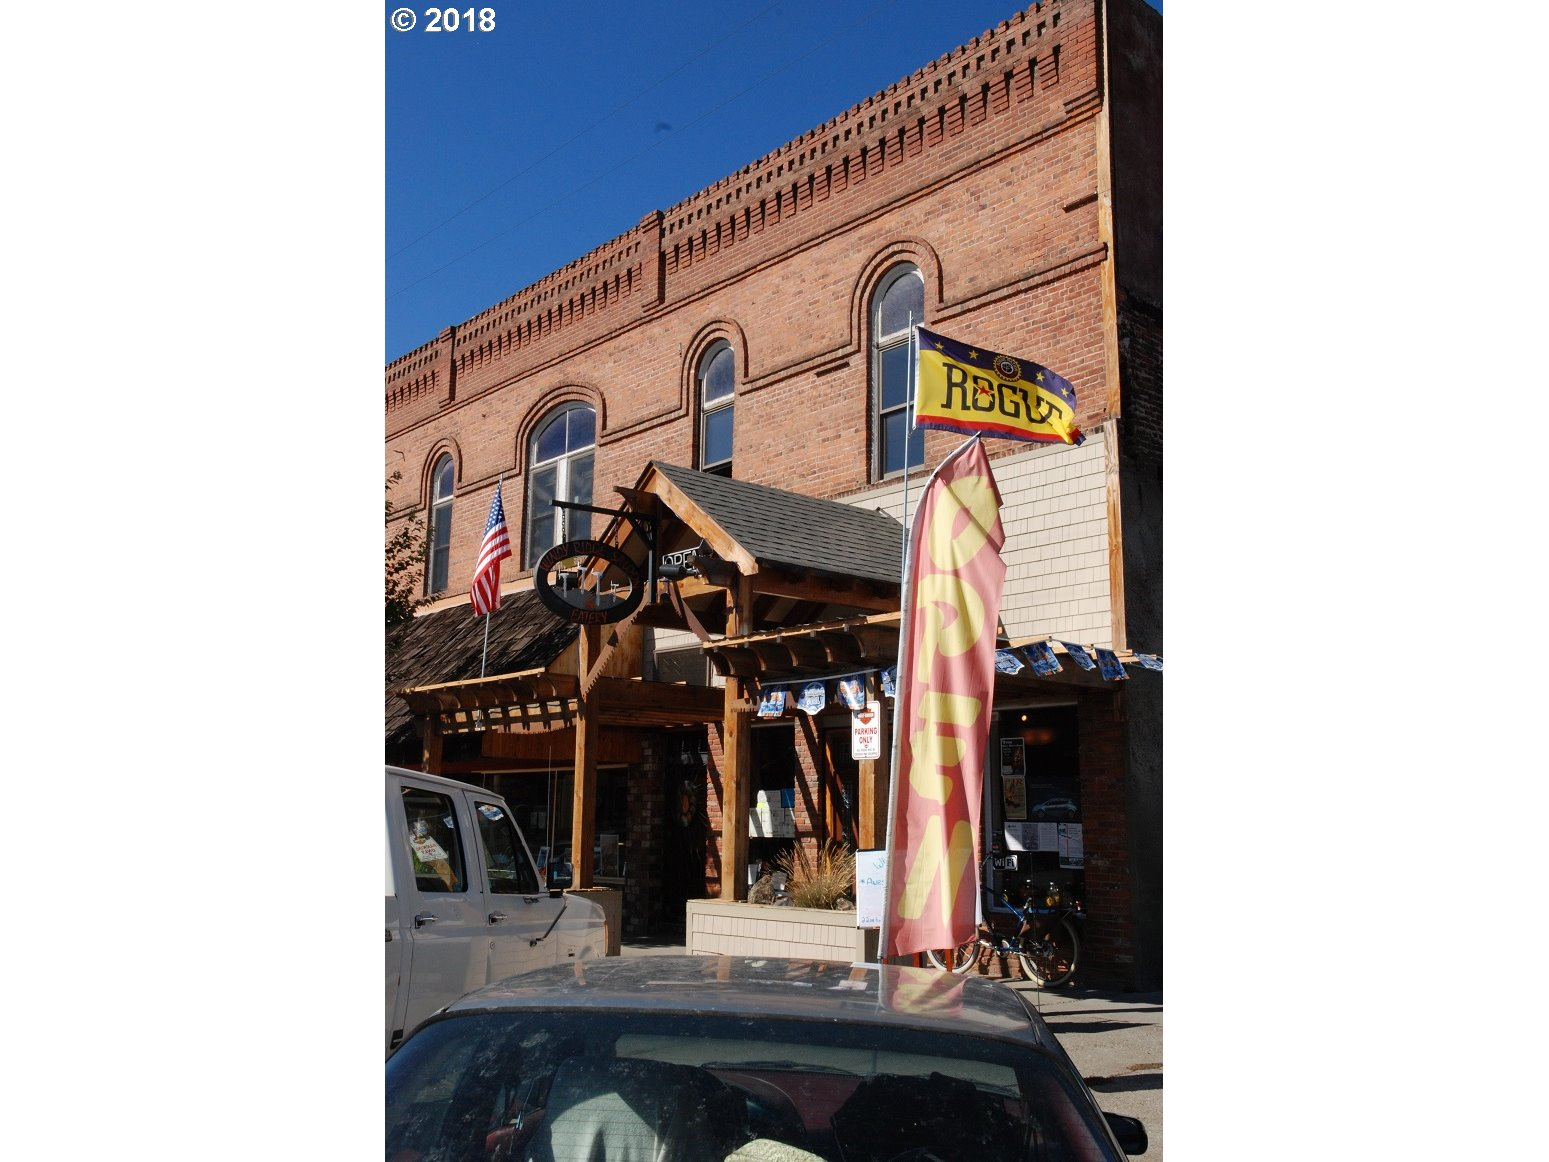 113 W MAIN ST, GOLDENDALE, WA 98620 | Copper West